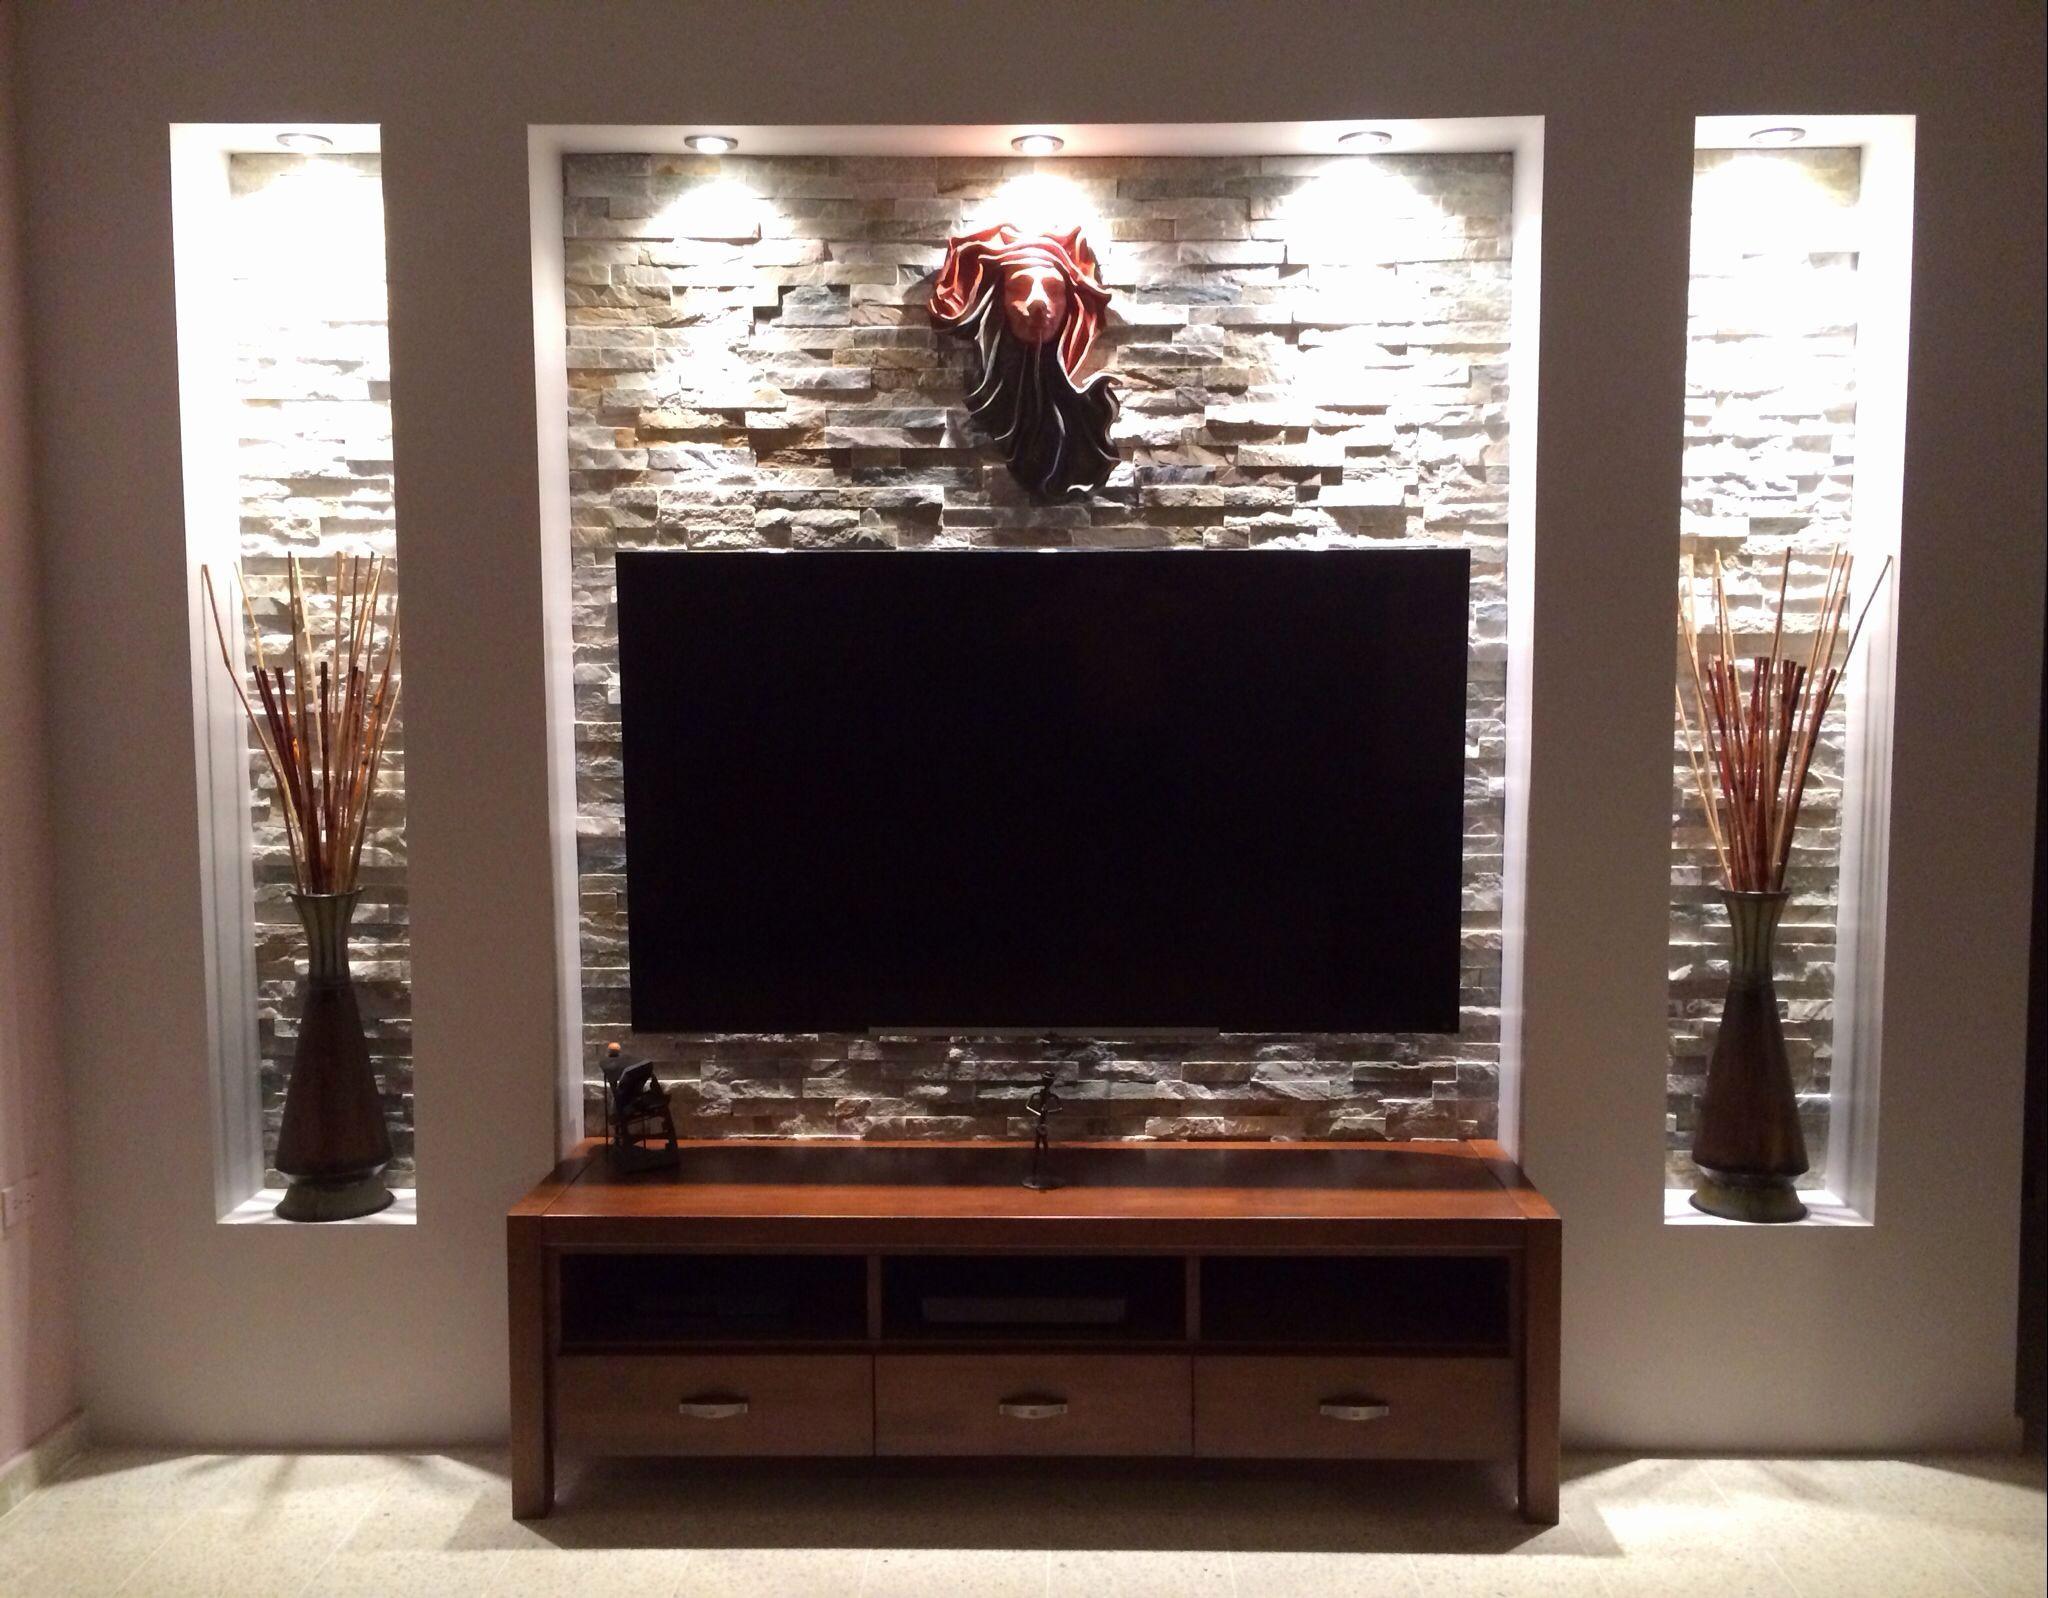 Wohnzimmer Tv Wand Ideen Genial Steinwand Mediawand Eigenbau